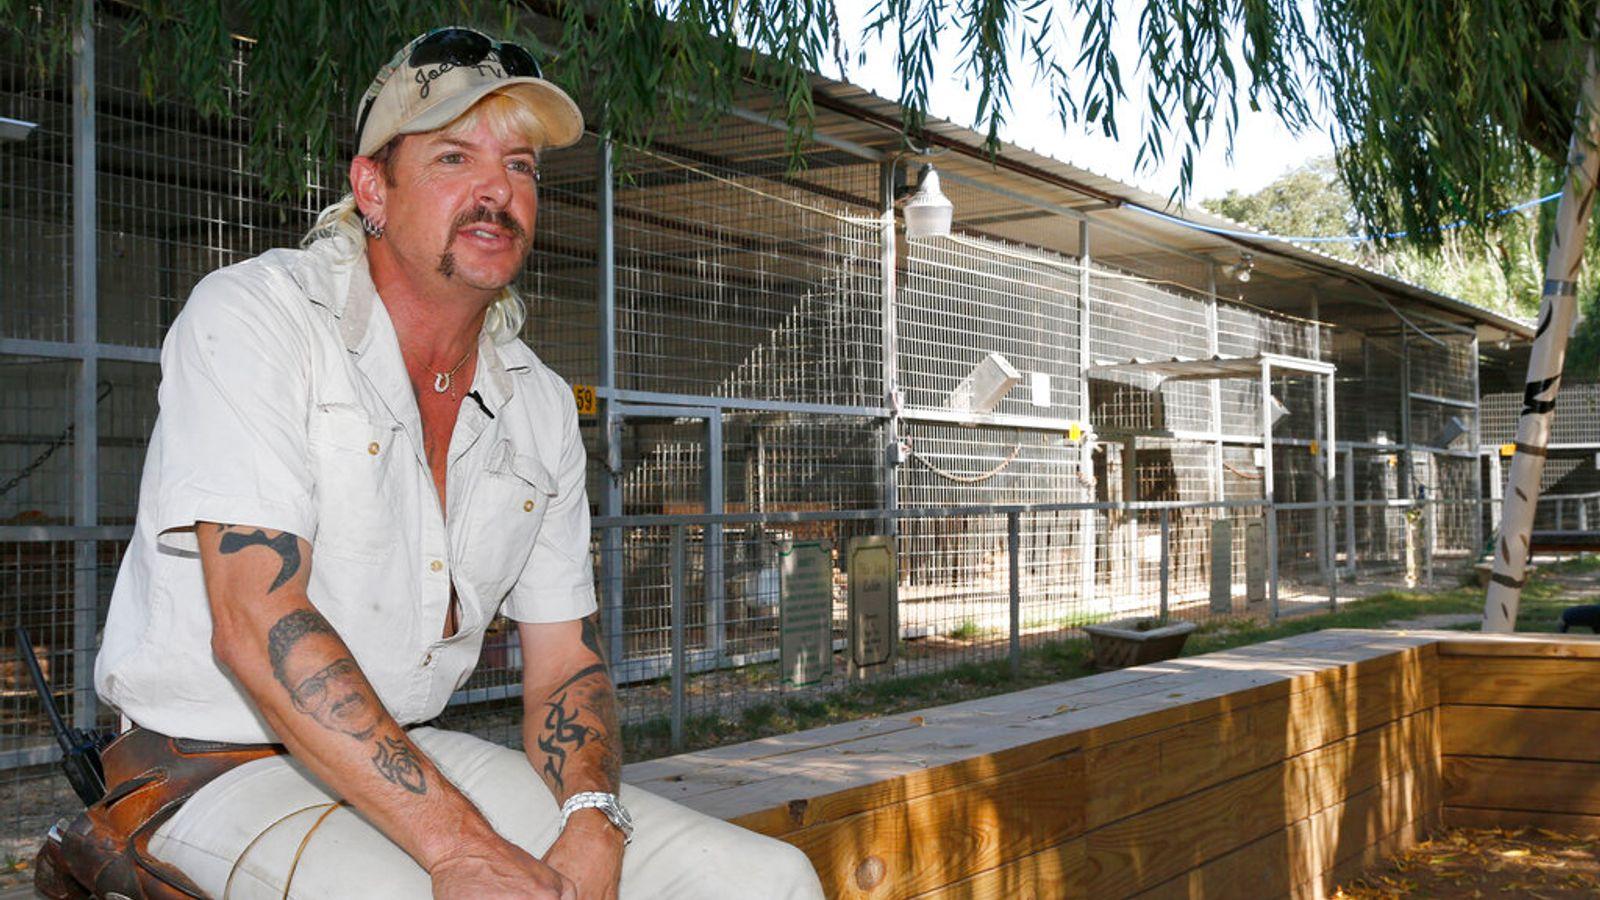 'Tiger King' Joe Exotic should have been given shorter prison sentence, appeals court rules